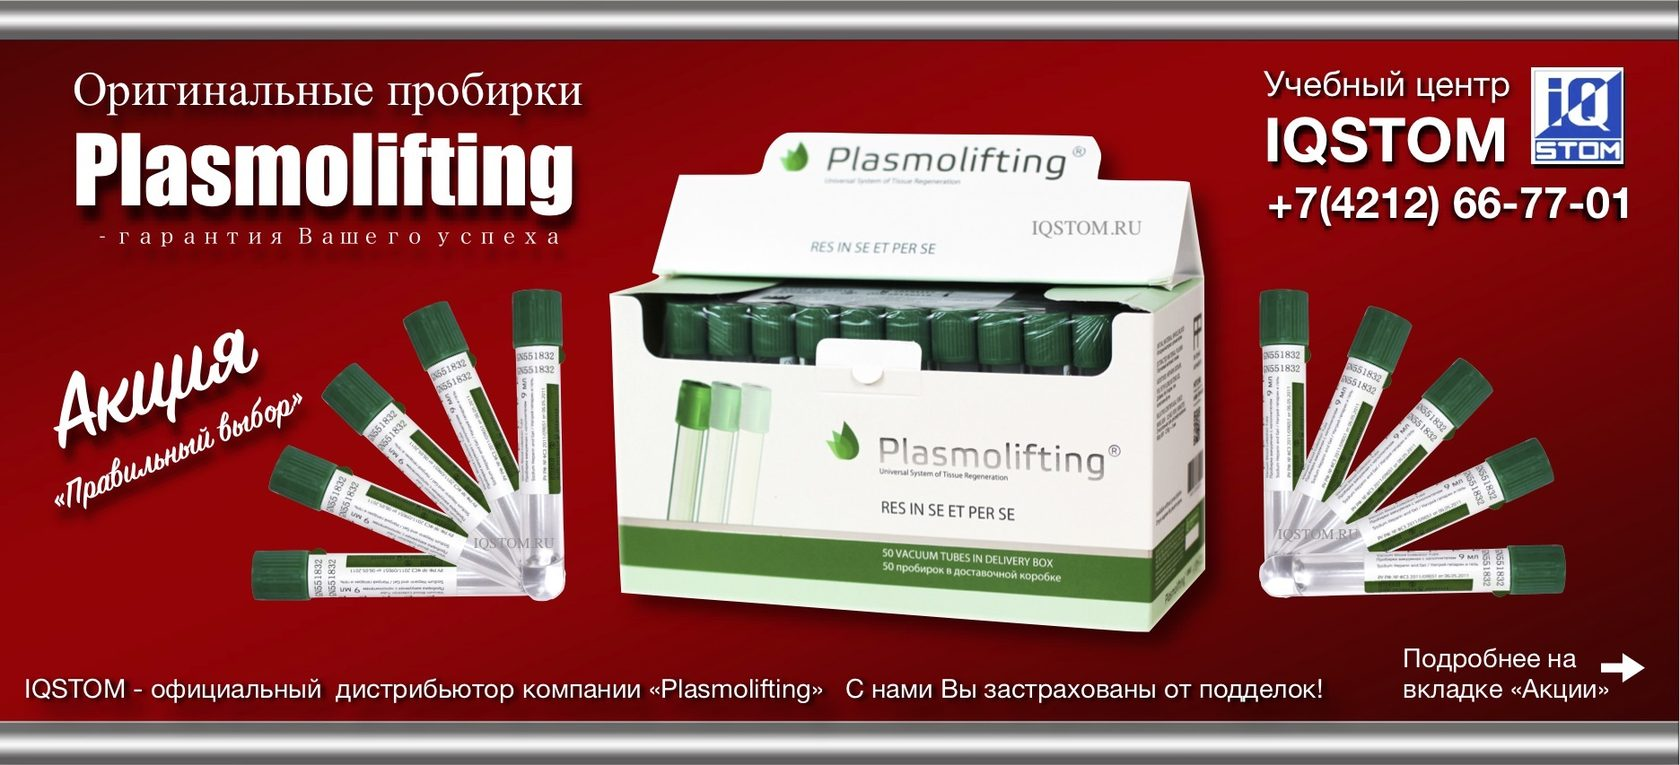 Акции на пробирки для плазмолифтинга